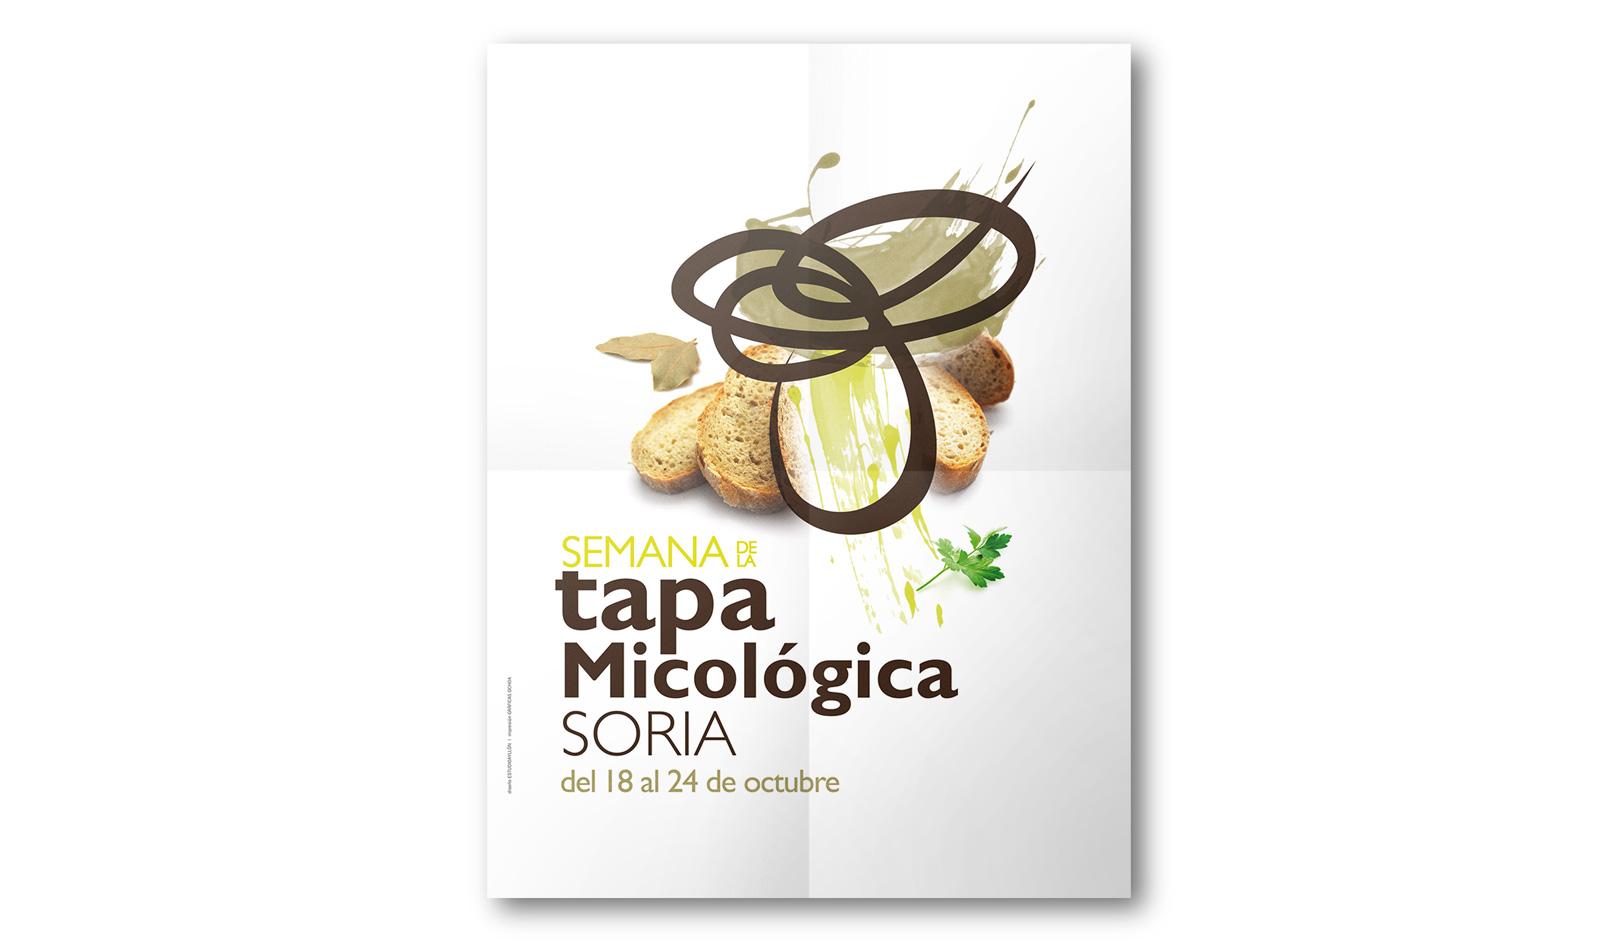 cartel_semana_tapa_micologica